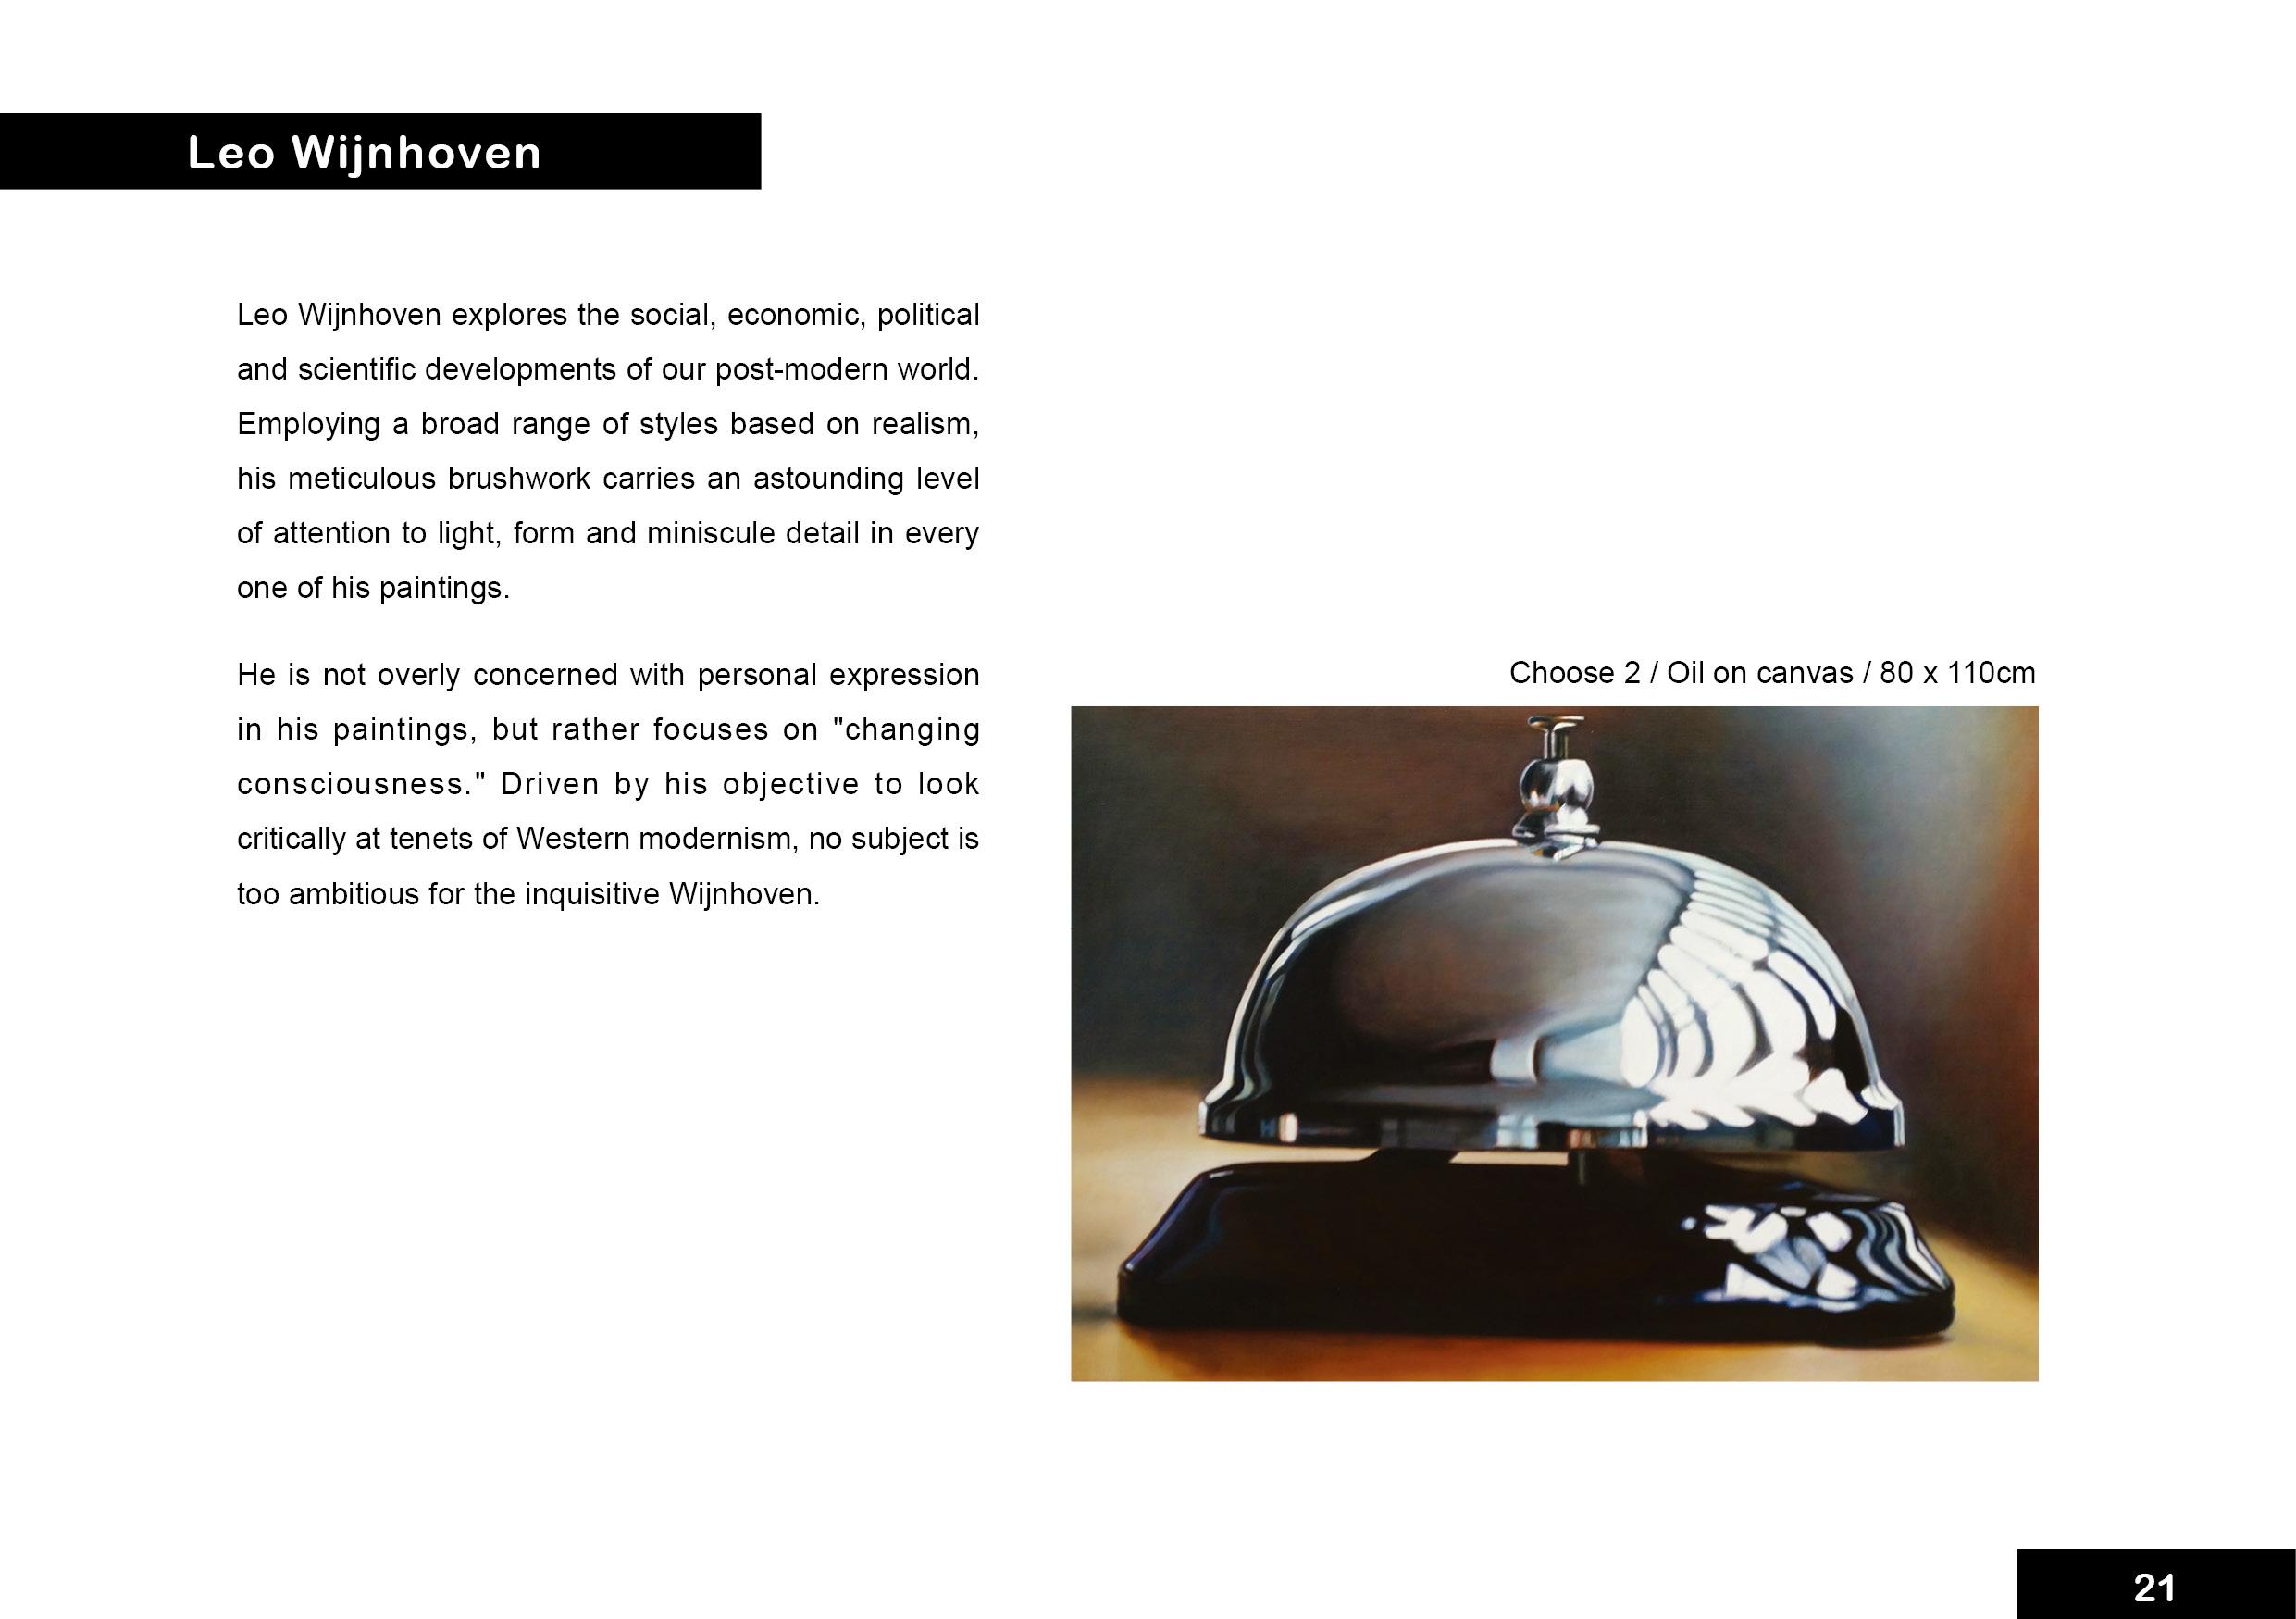 Catalog_page 21